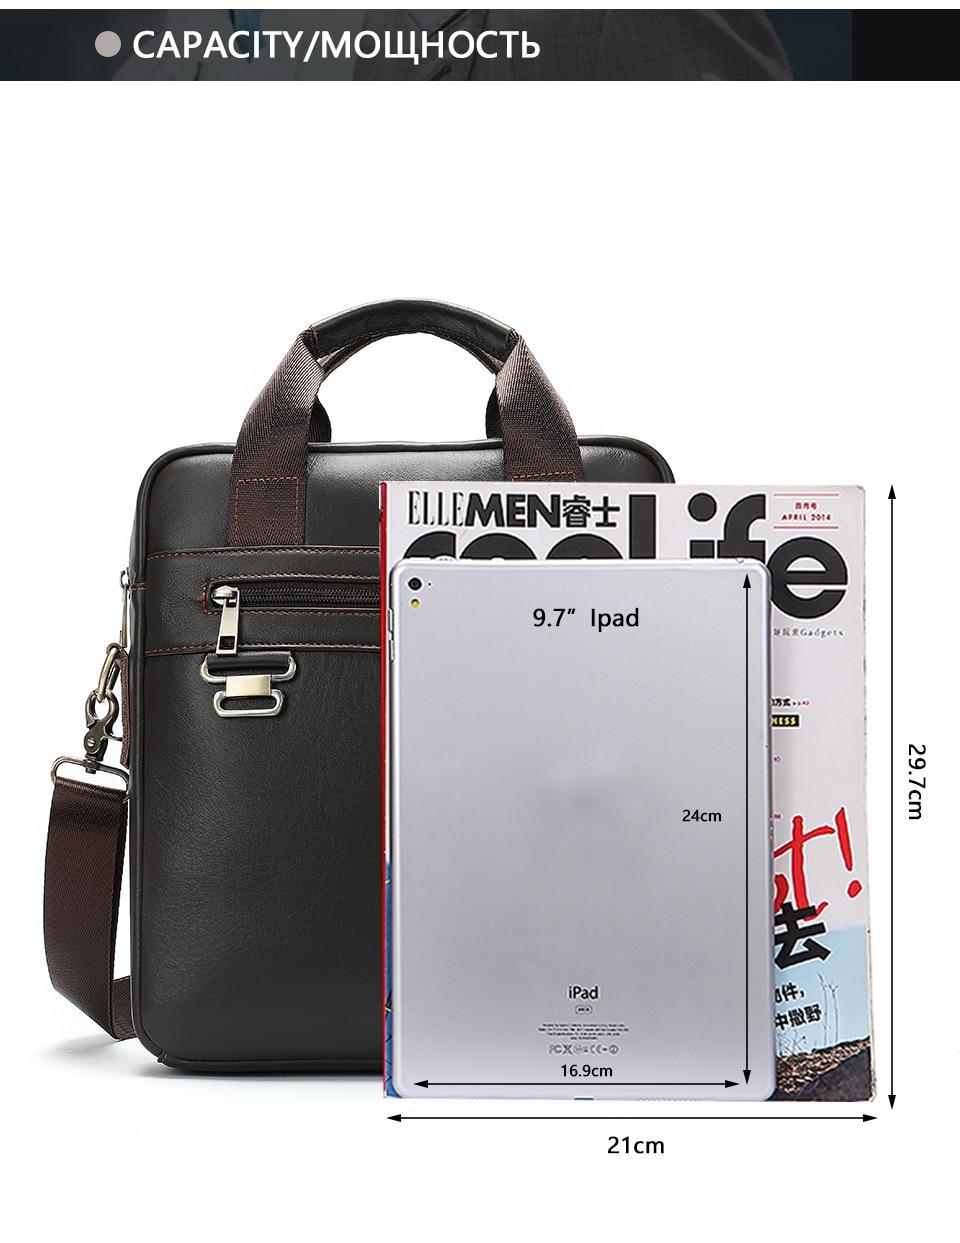 Men \' s Shoulder Bag Male Genuine Leather Crossbody Bags for Men Messenger Bag Casual Vintage Clutch Handbags bolsos 23